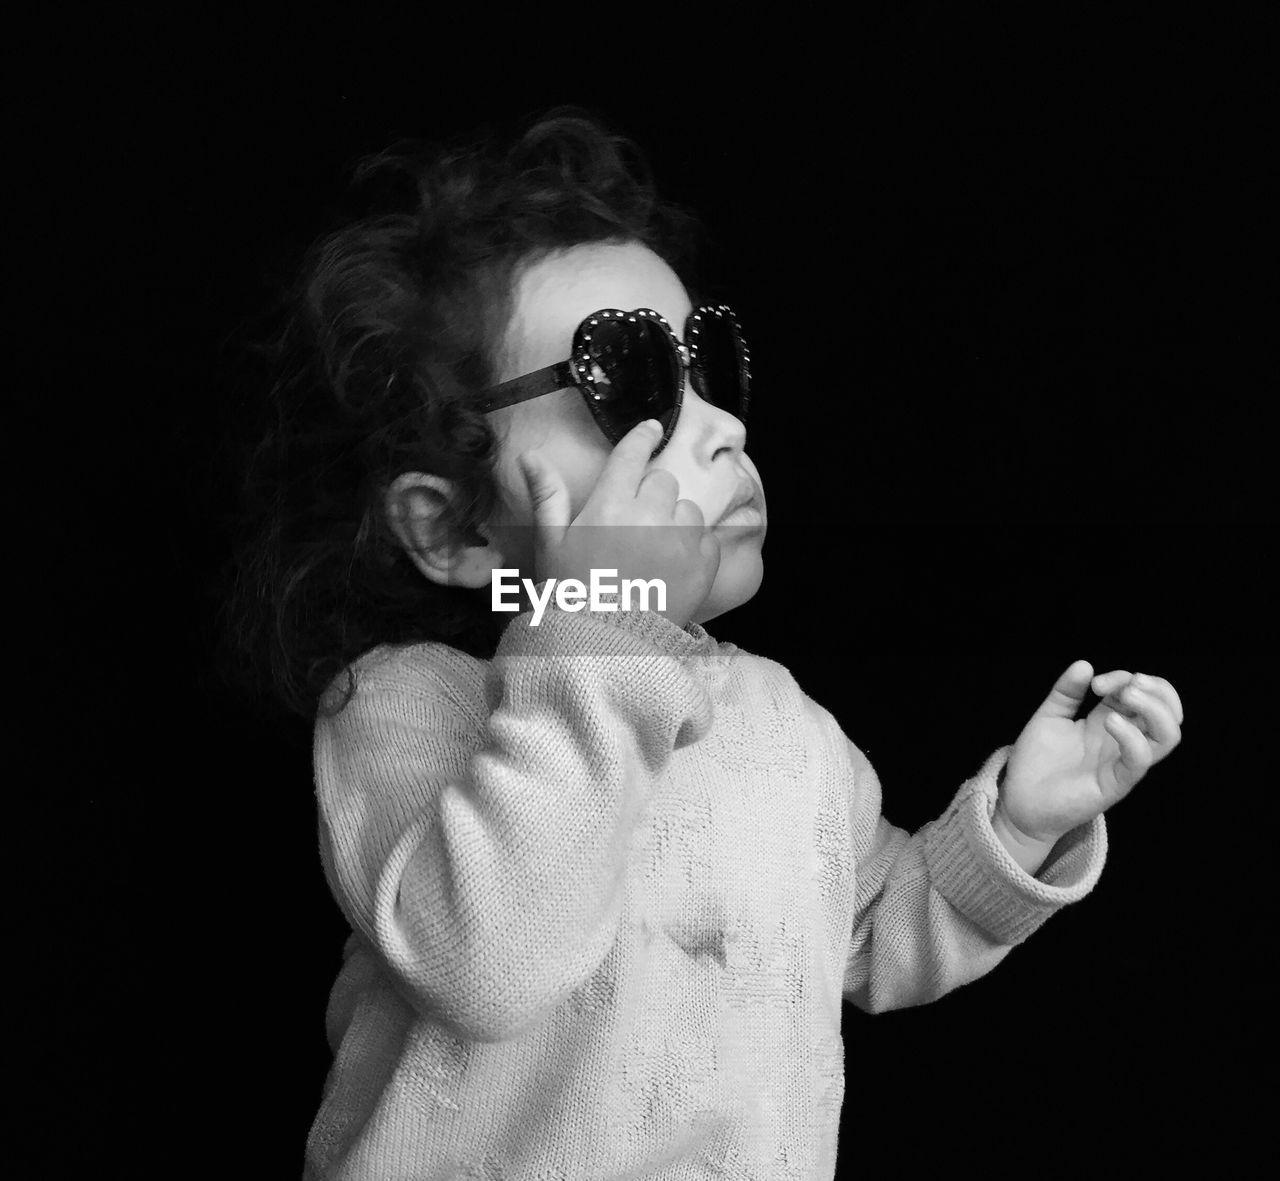 Girl Wearing Sunglasses Against Black Background